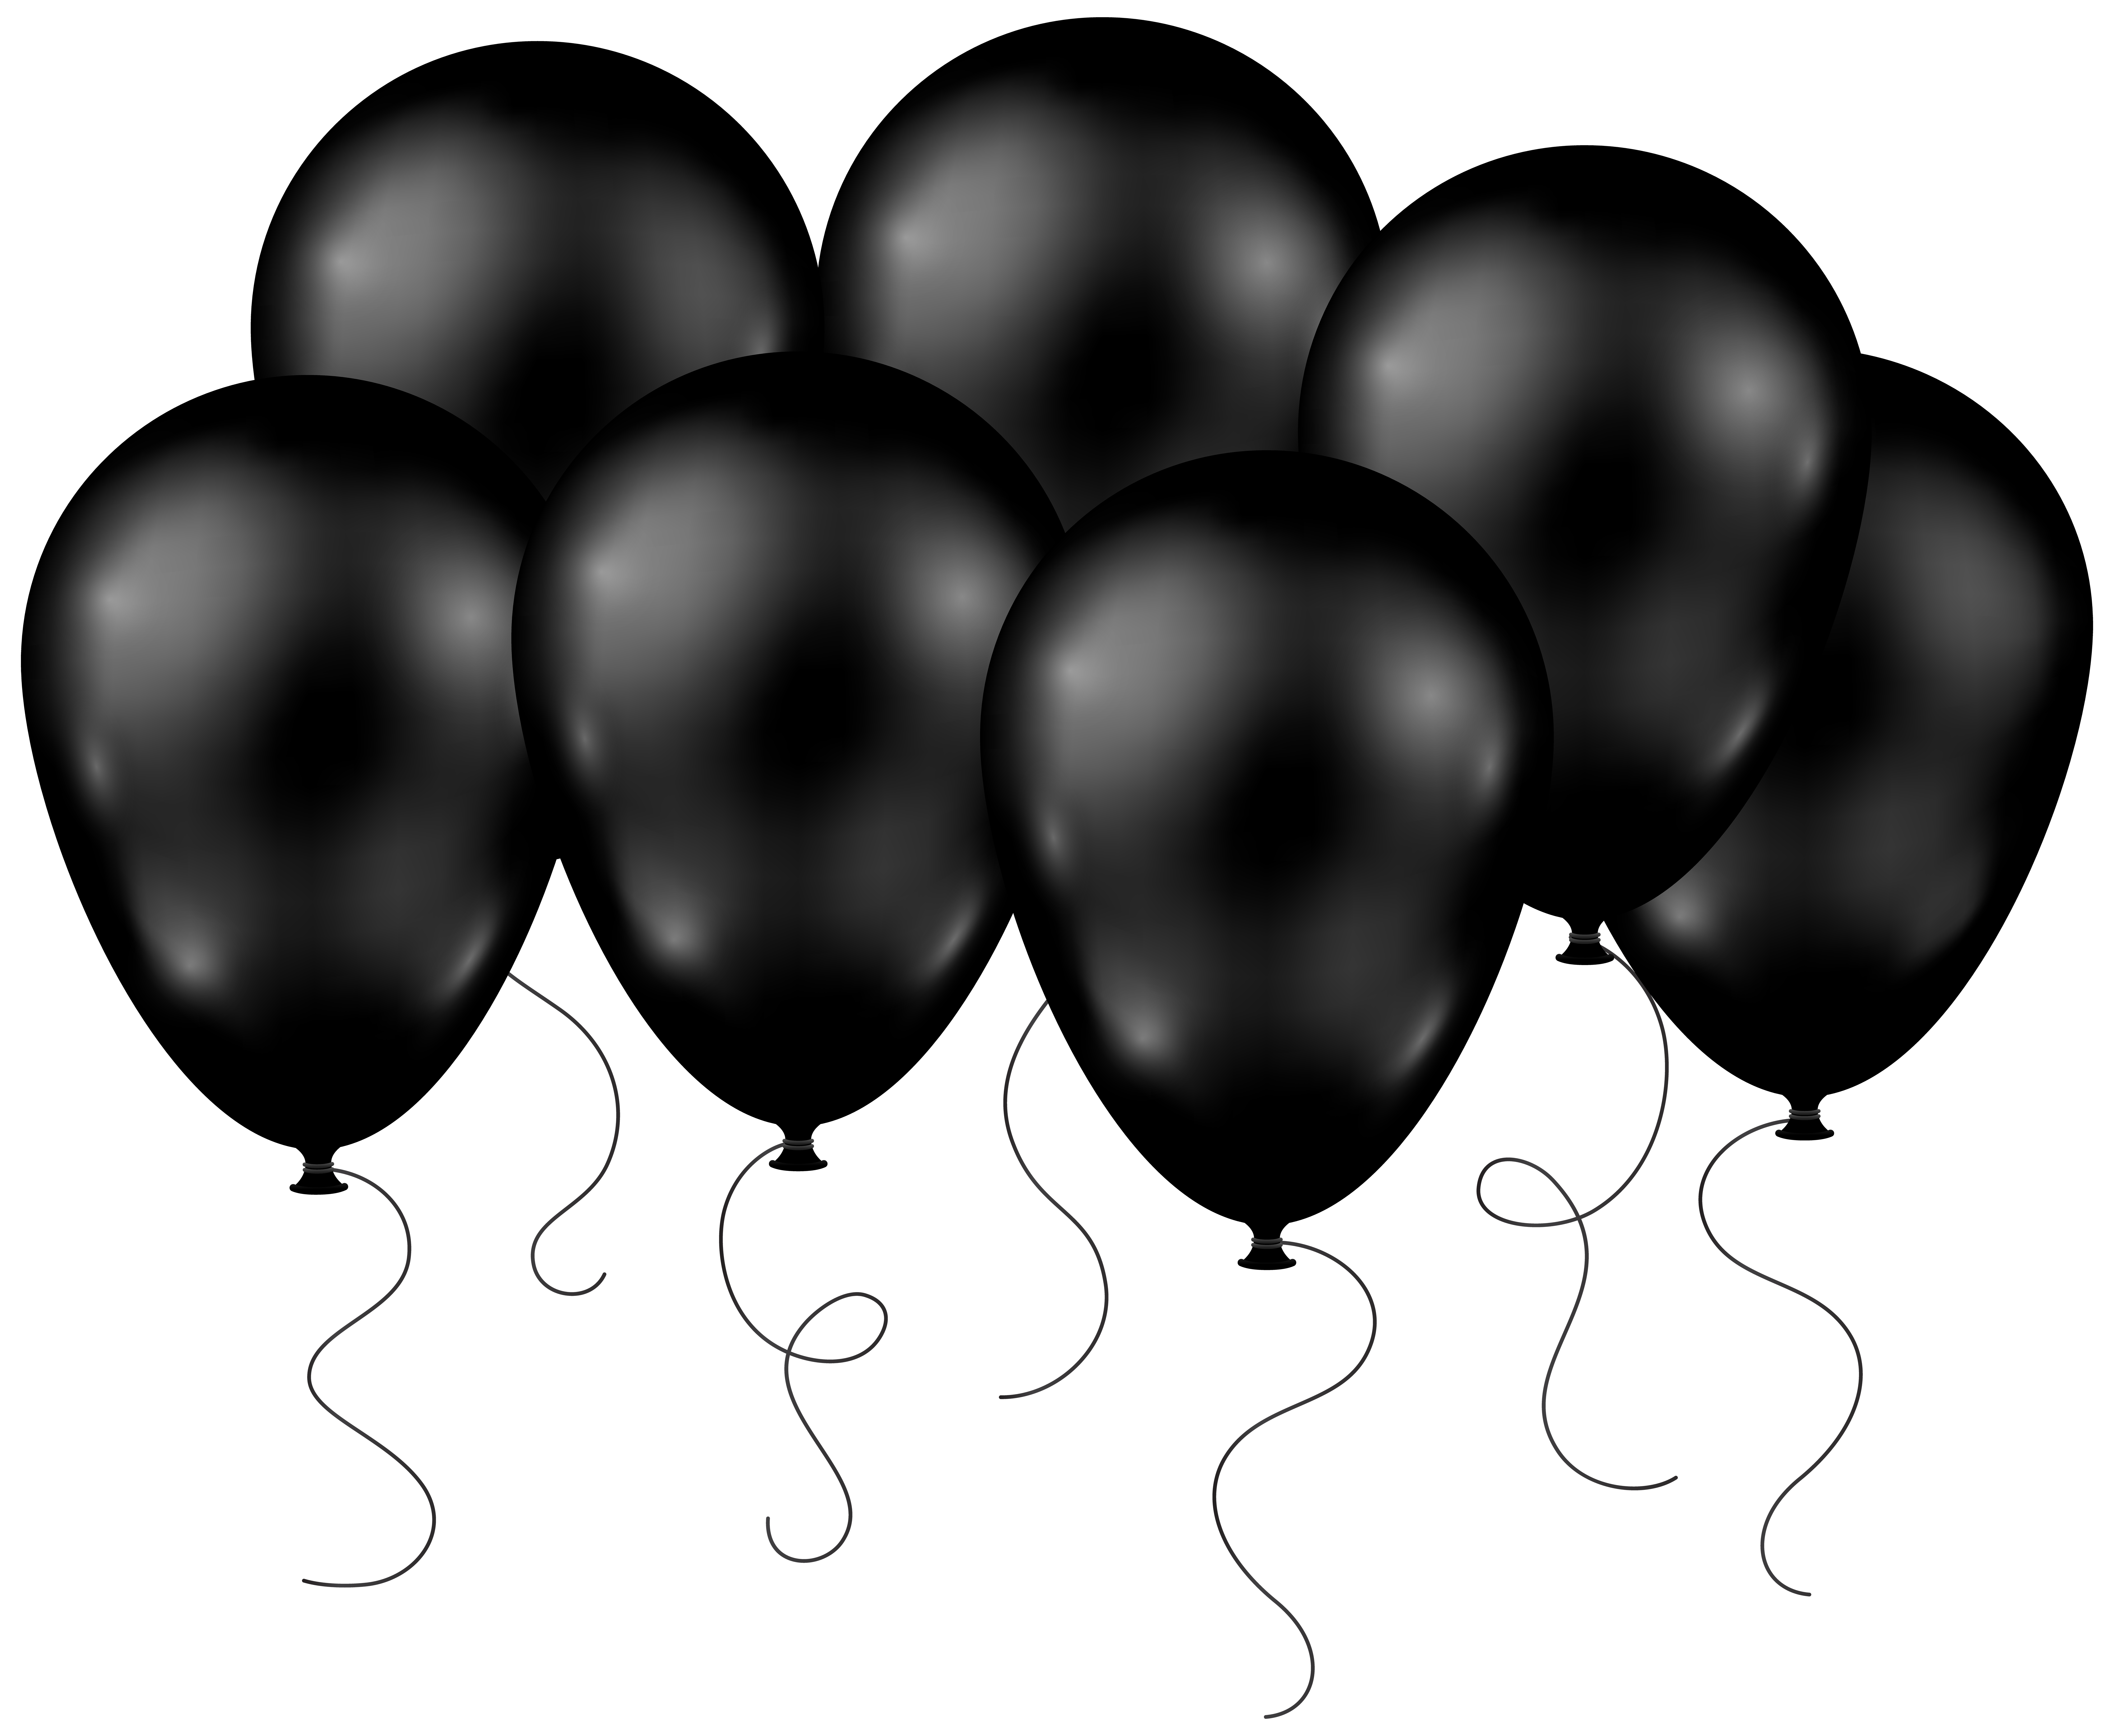 8000x6571 Black Balloons Transparent Png Clip Art Imageu200b Gallery